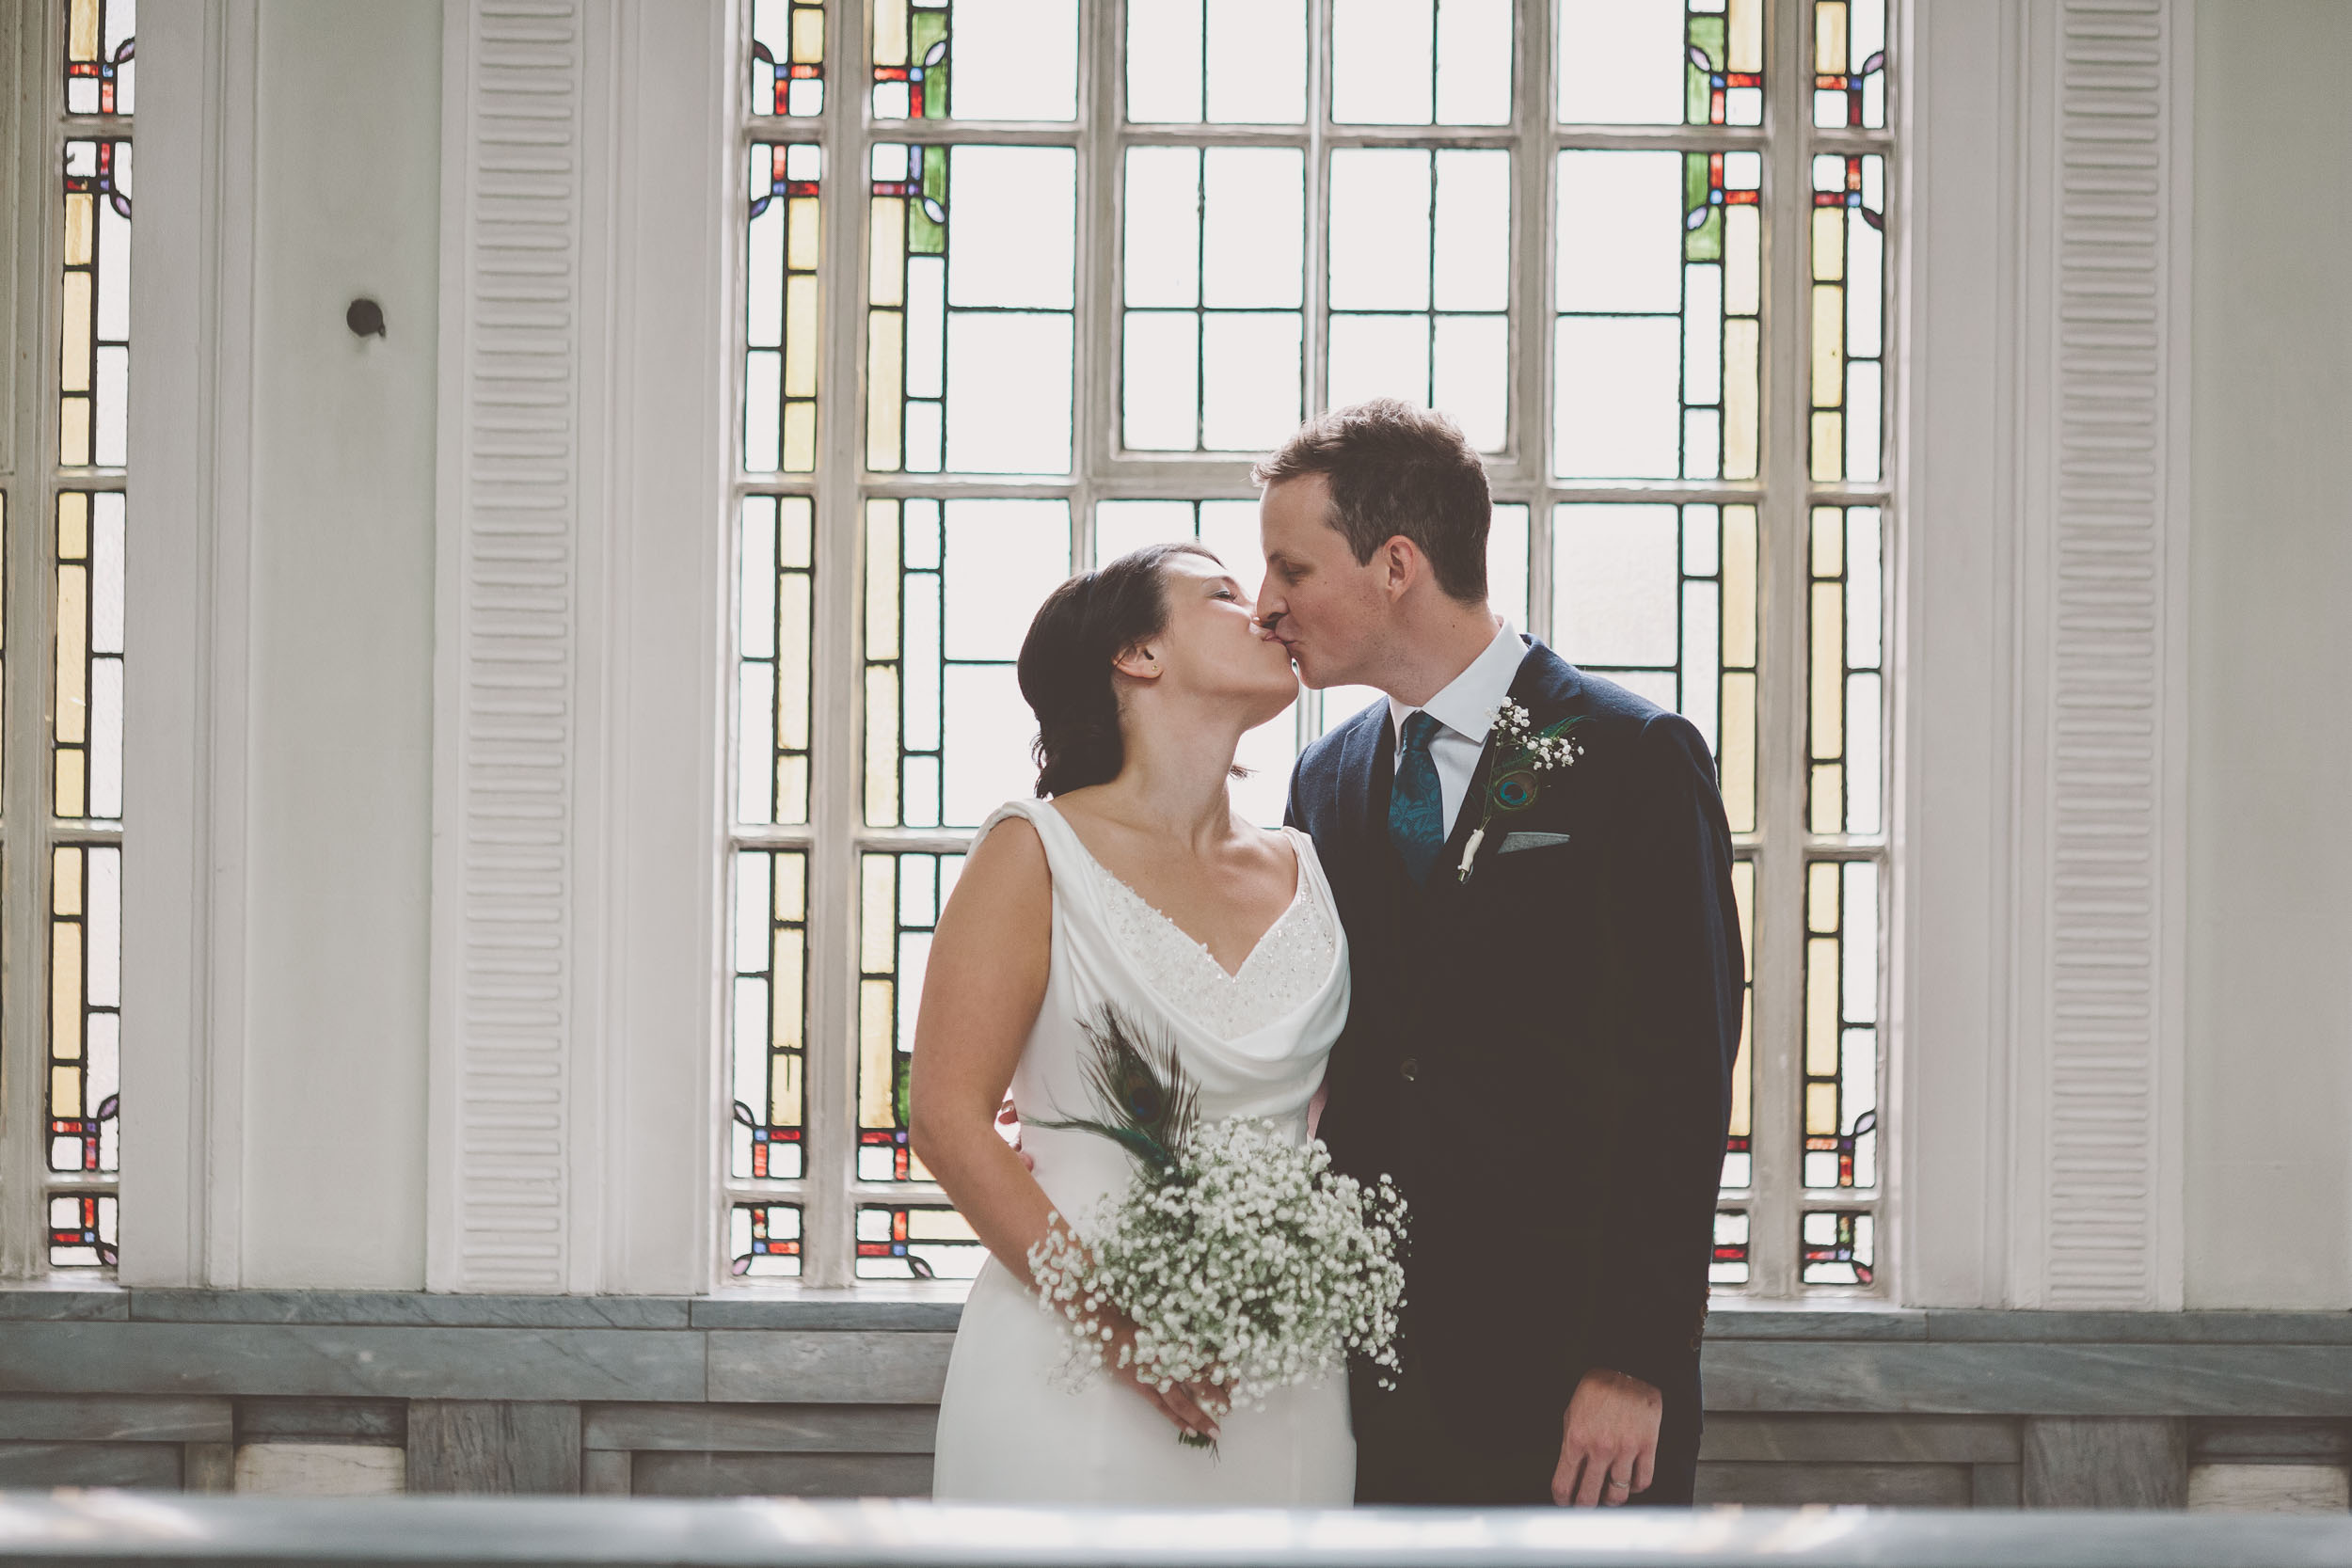 islington-town-hall-4th-floor-studios-wedding139.jpg